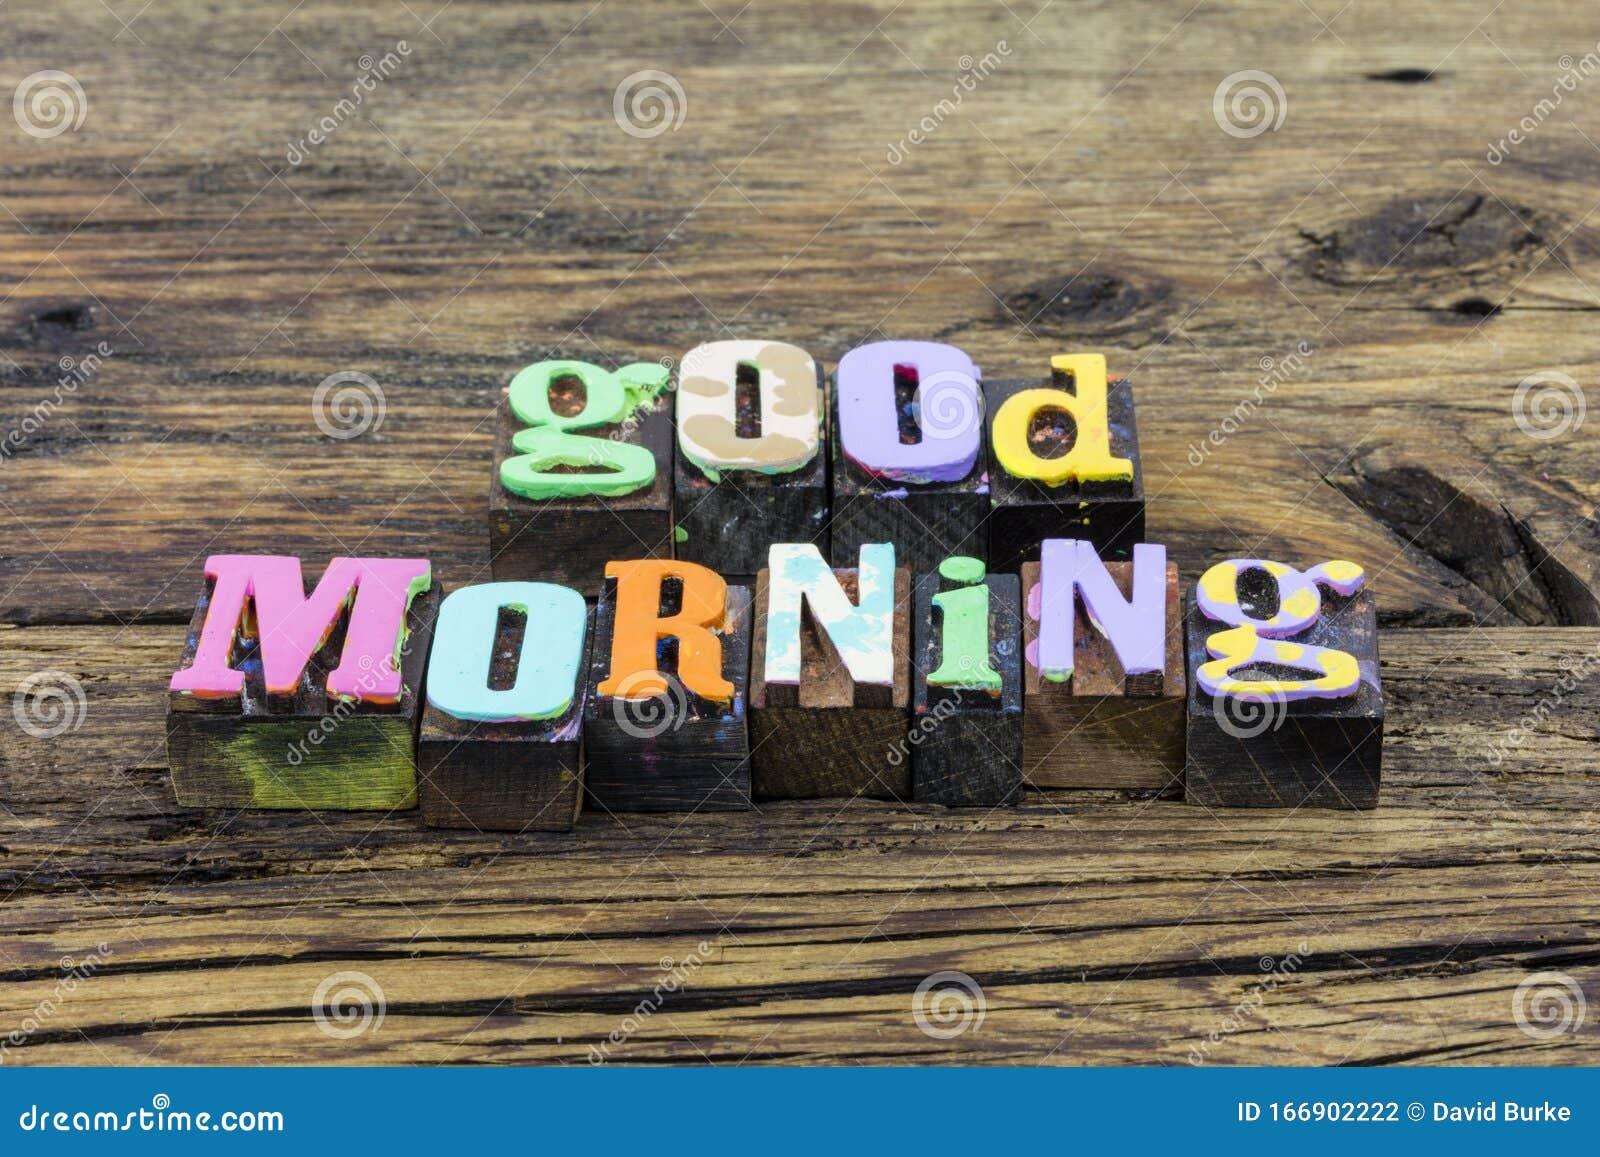 Good Morning Sunshine Breakfast Greeting Happy Day Family Couple Relationship Stock Photo Image Of Breakfast Letter 166902222